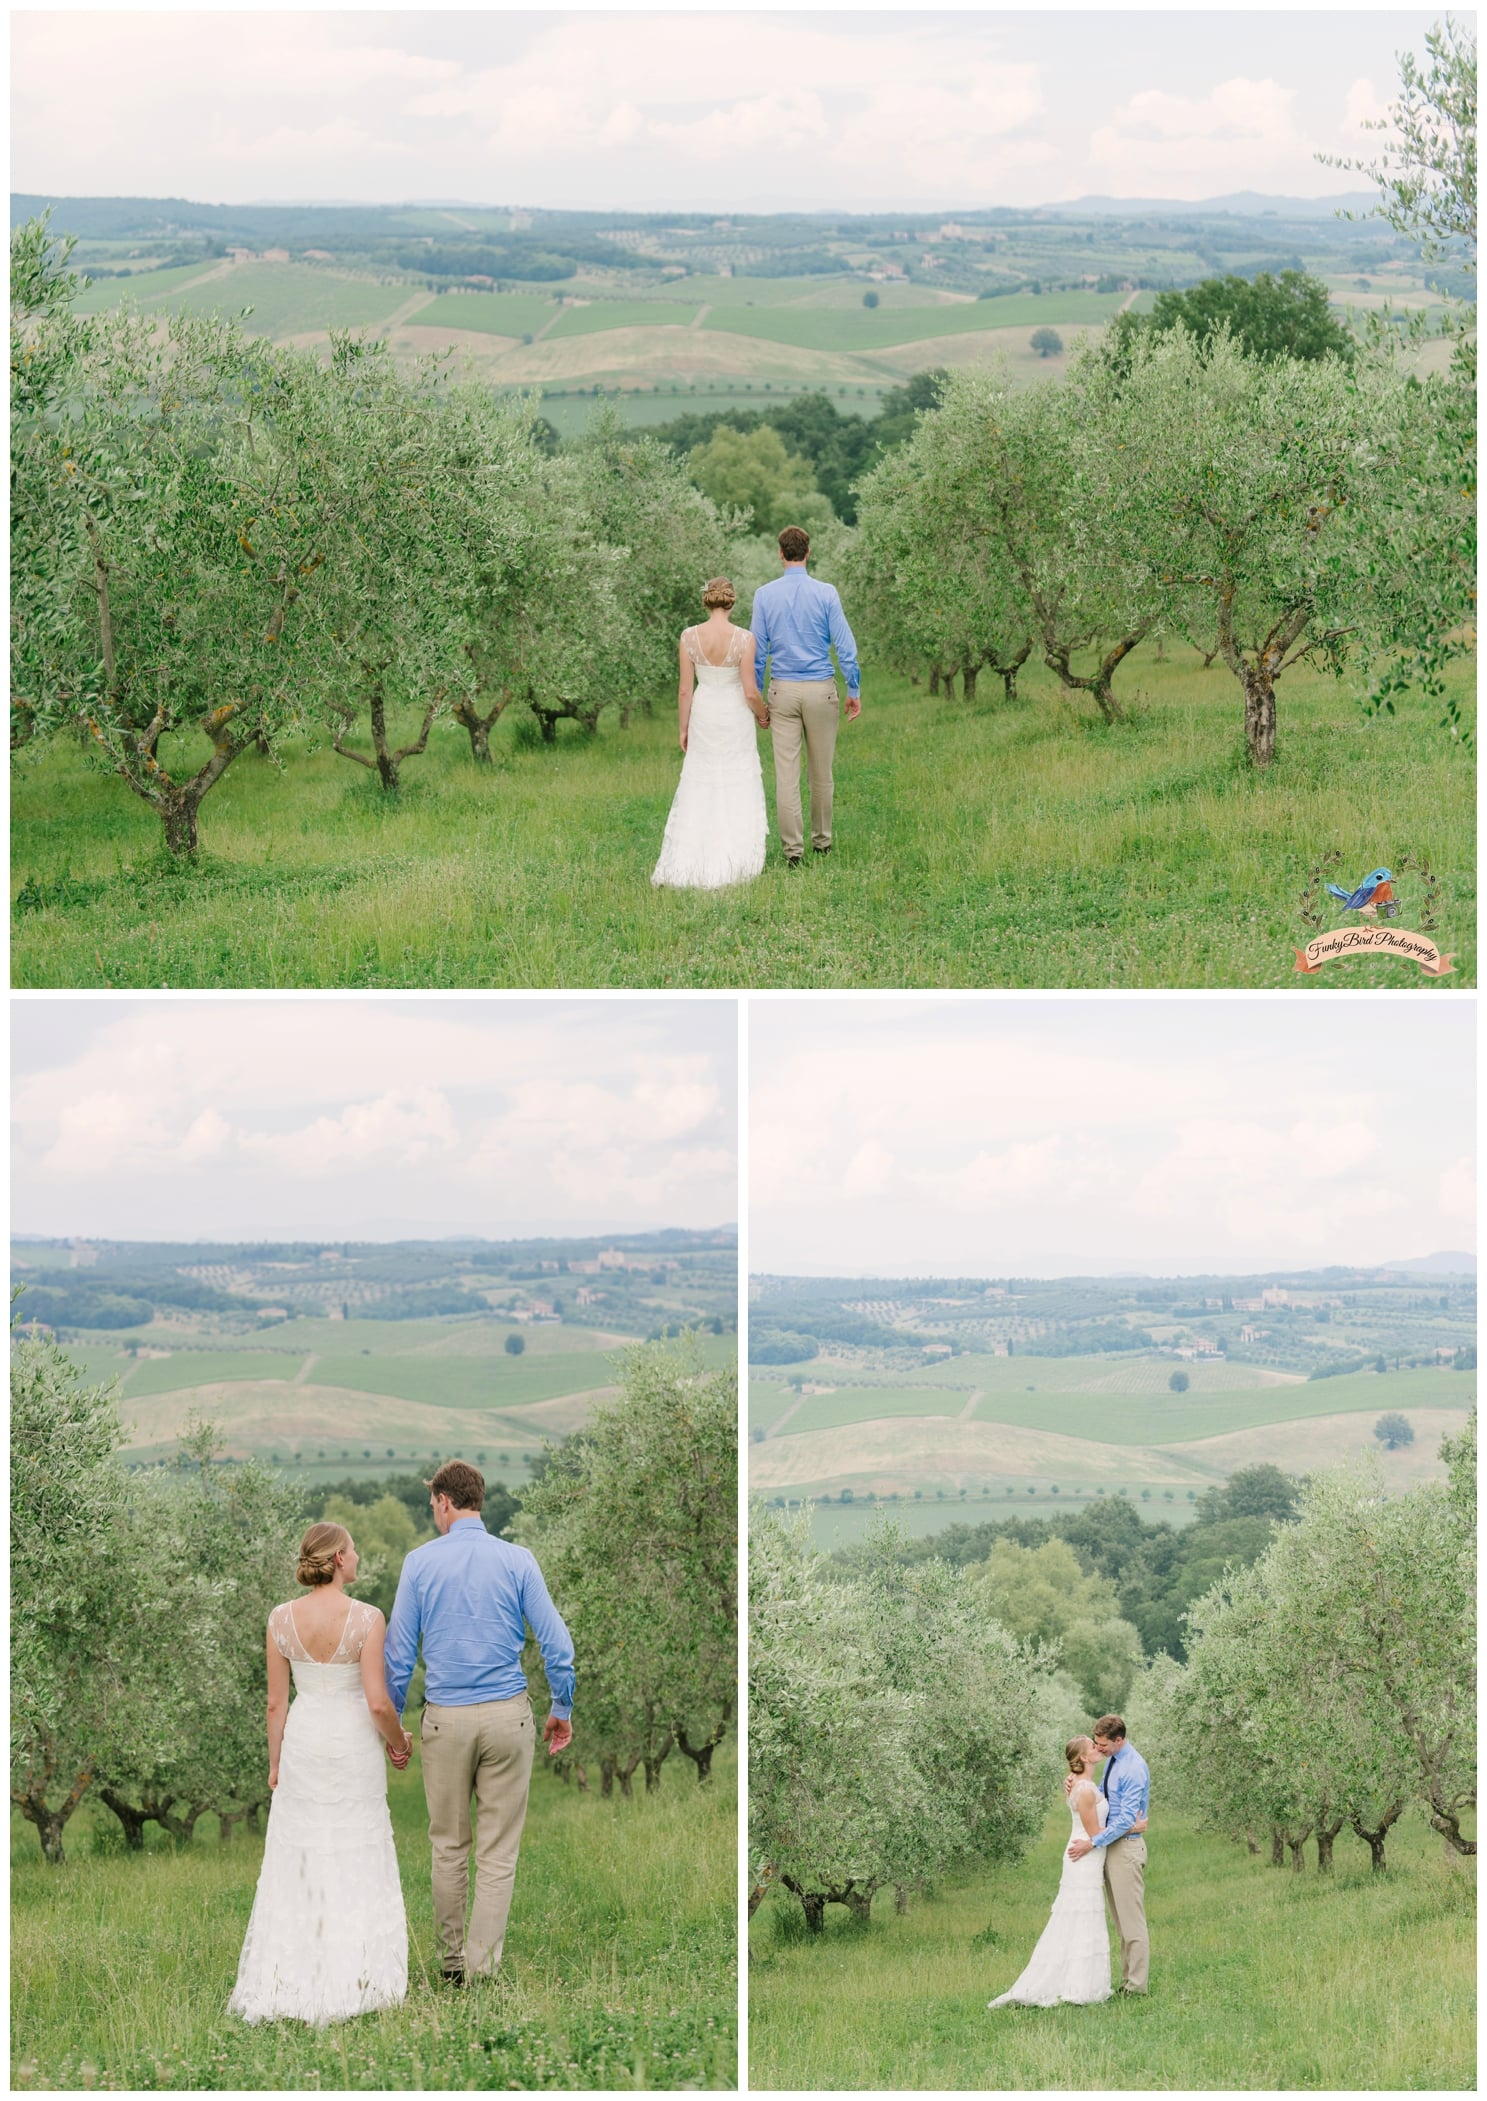 Wedding_Photographer_in_Tuscany_Italy_0034.jpg